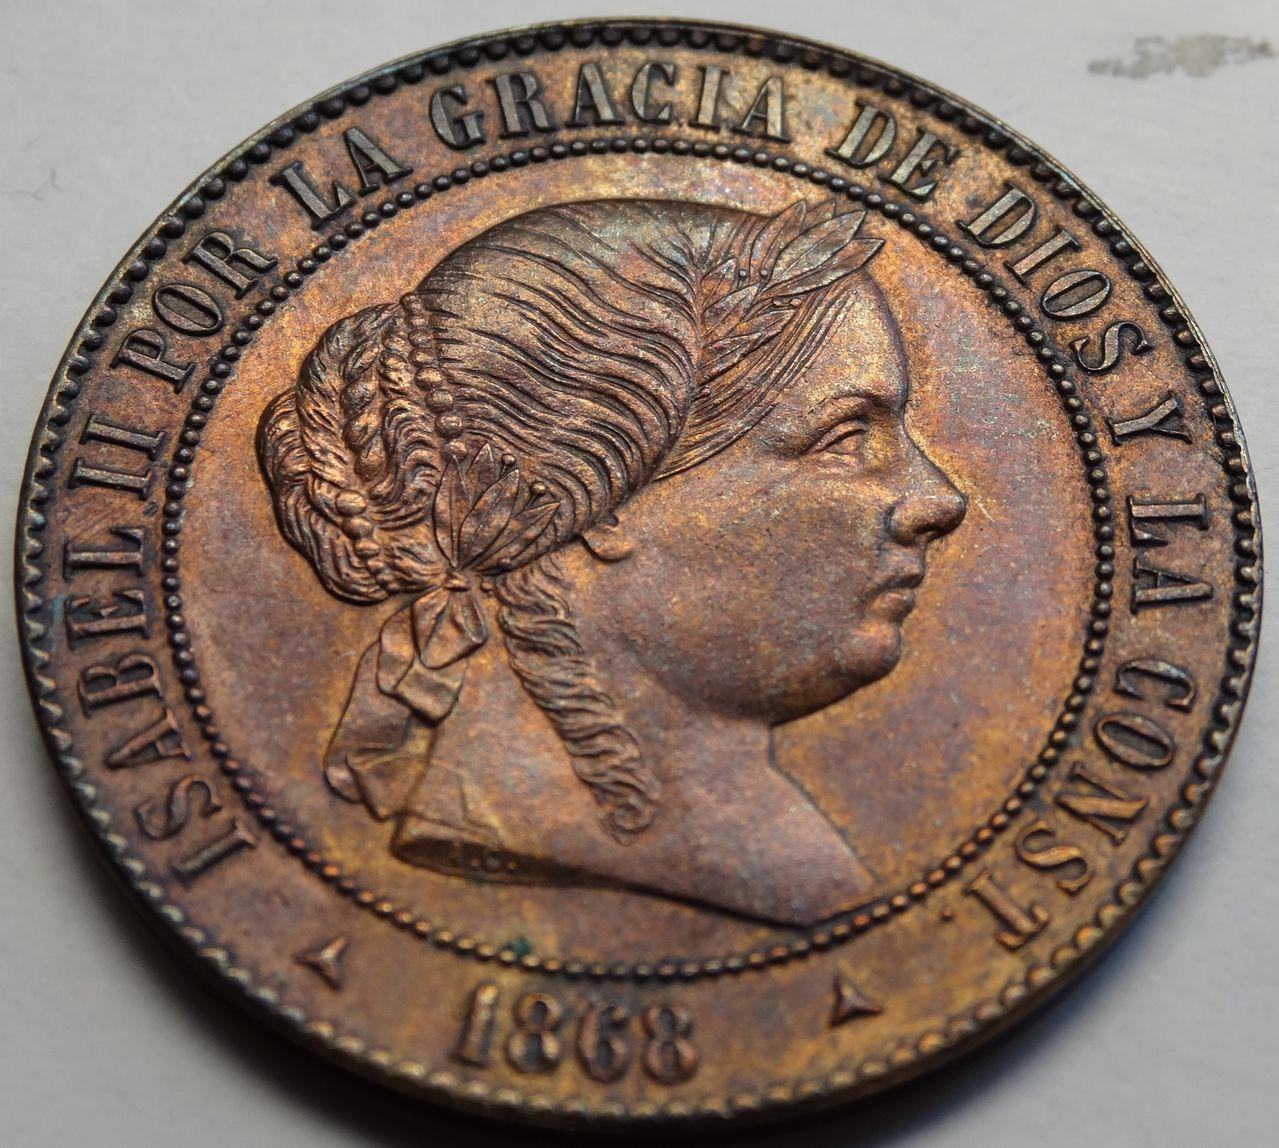 5 CENTIMOS DE ESCUDO 1868 SEGOVIA ISABEL II SC DSC02486